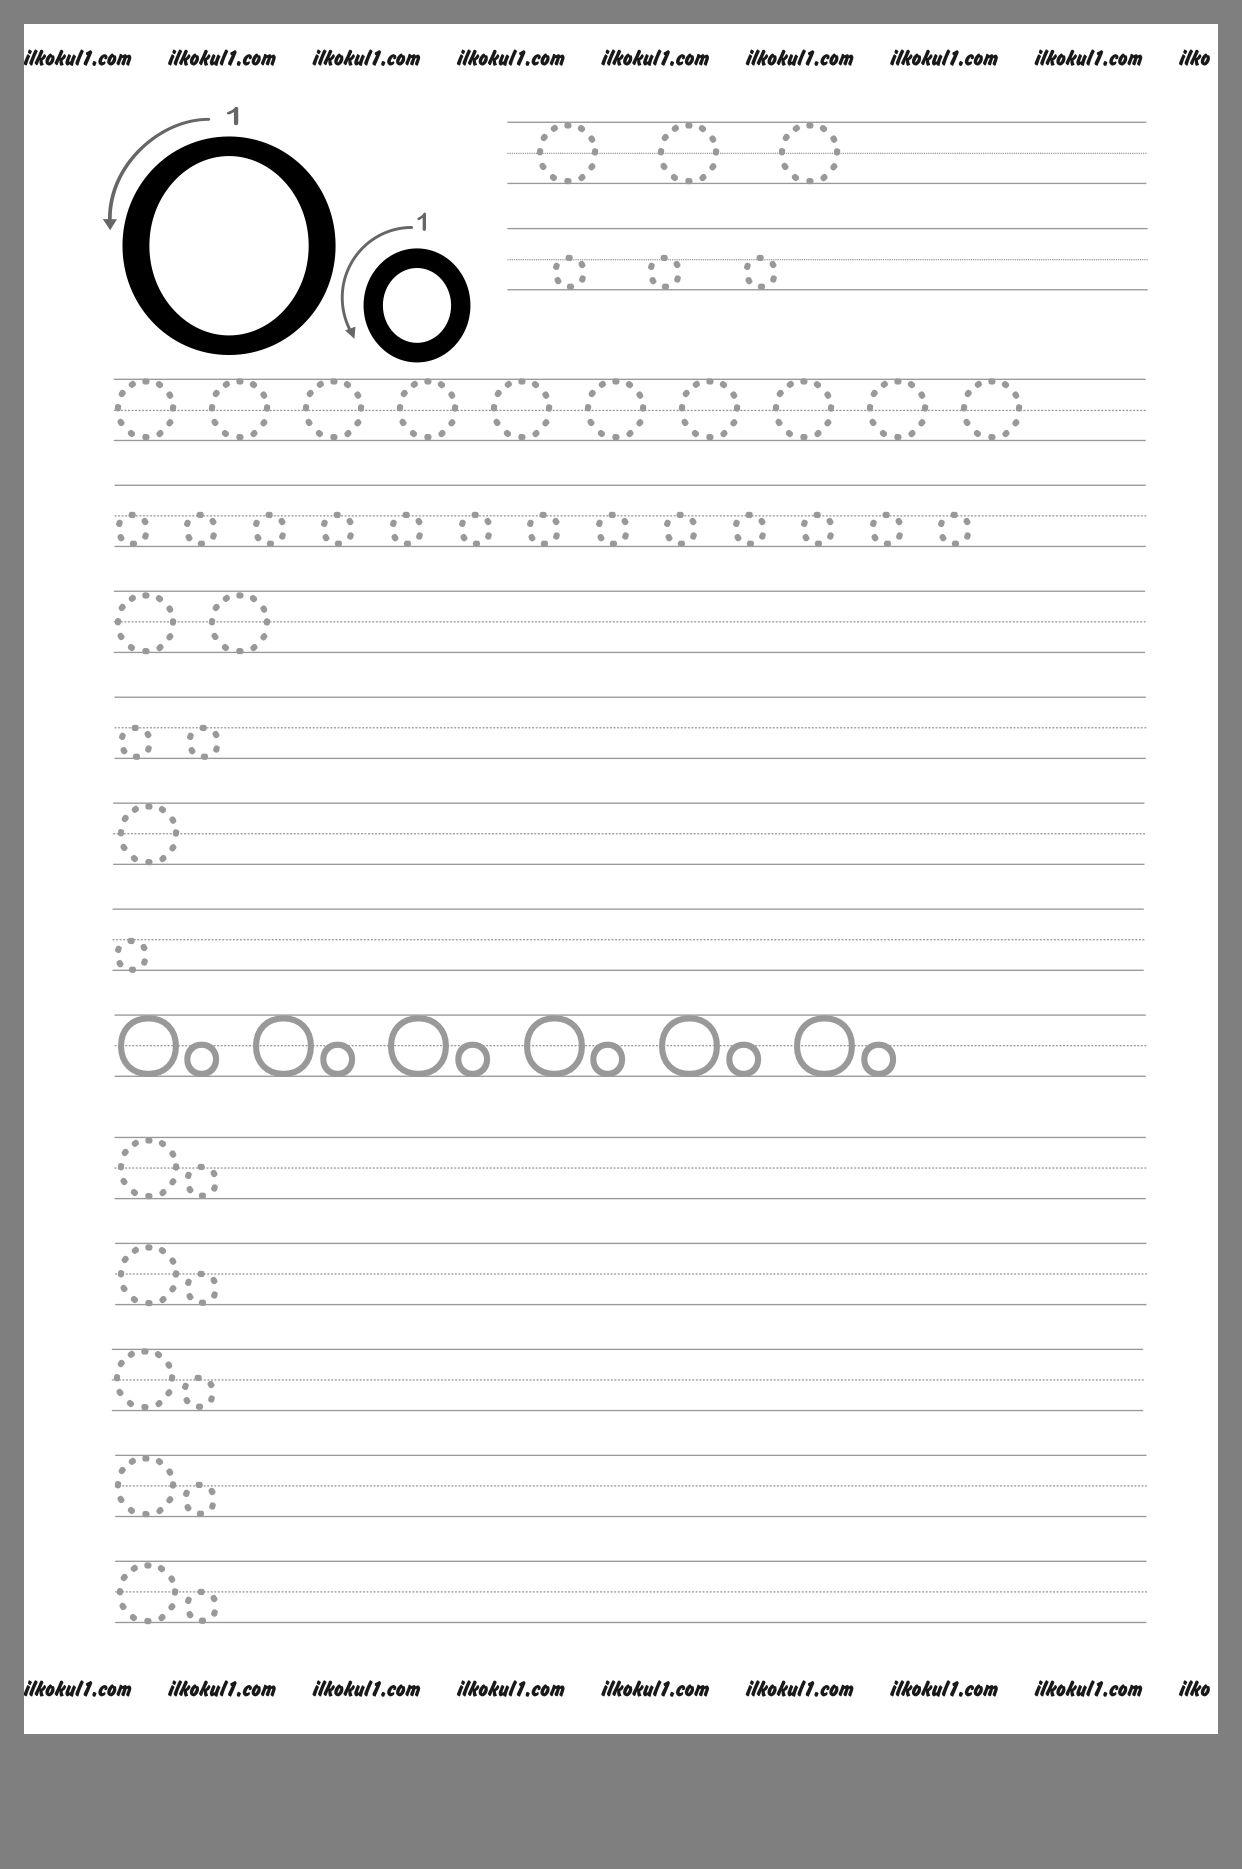 Pin By Horvathne Kovacs On Iskolai Elokeszto Feladatok In 2020 Alphabet Worksheets Preschool Alphabet Activities Preschool Grade R Worksheets